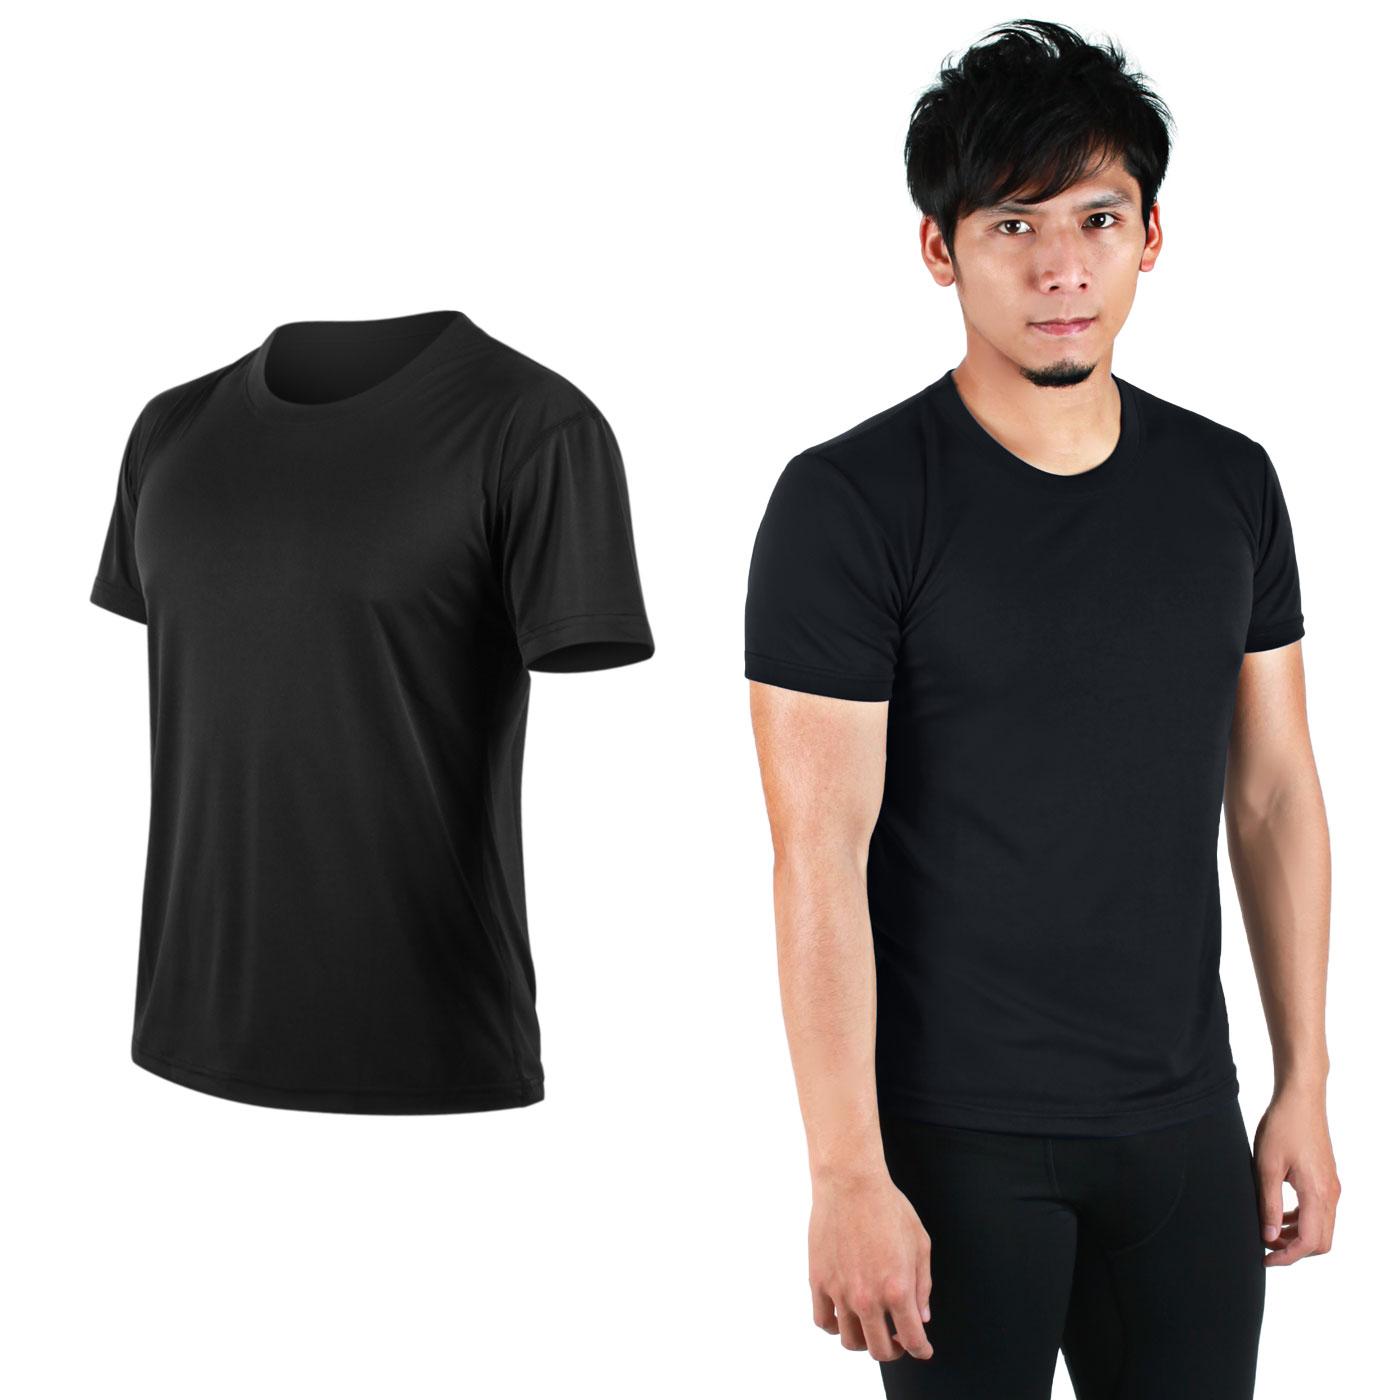 HODARLA FLARE 100 吸濕排汗衫3108301 - 黑